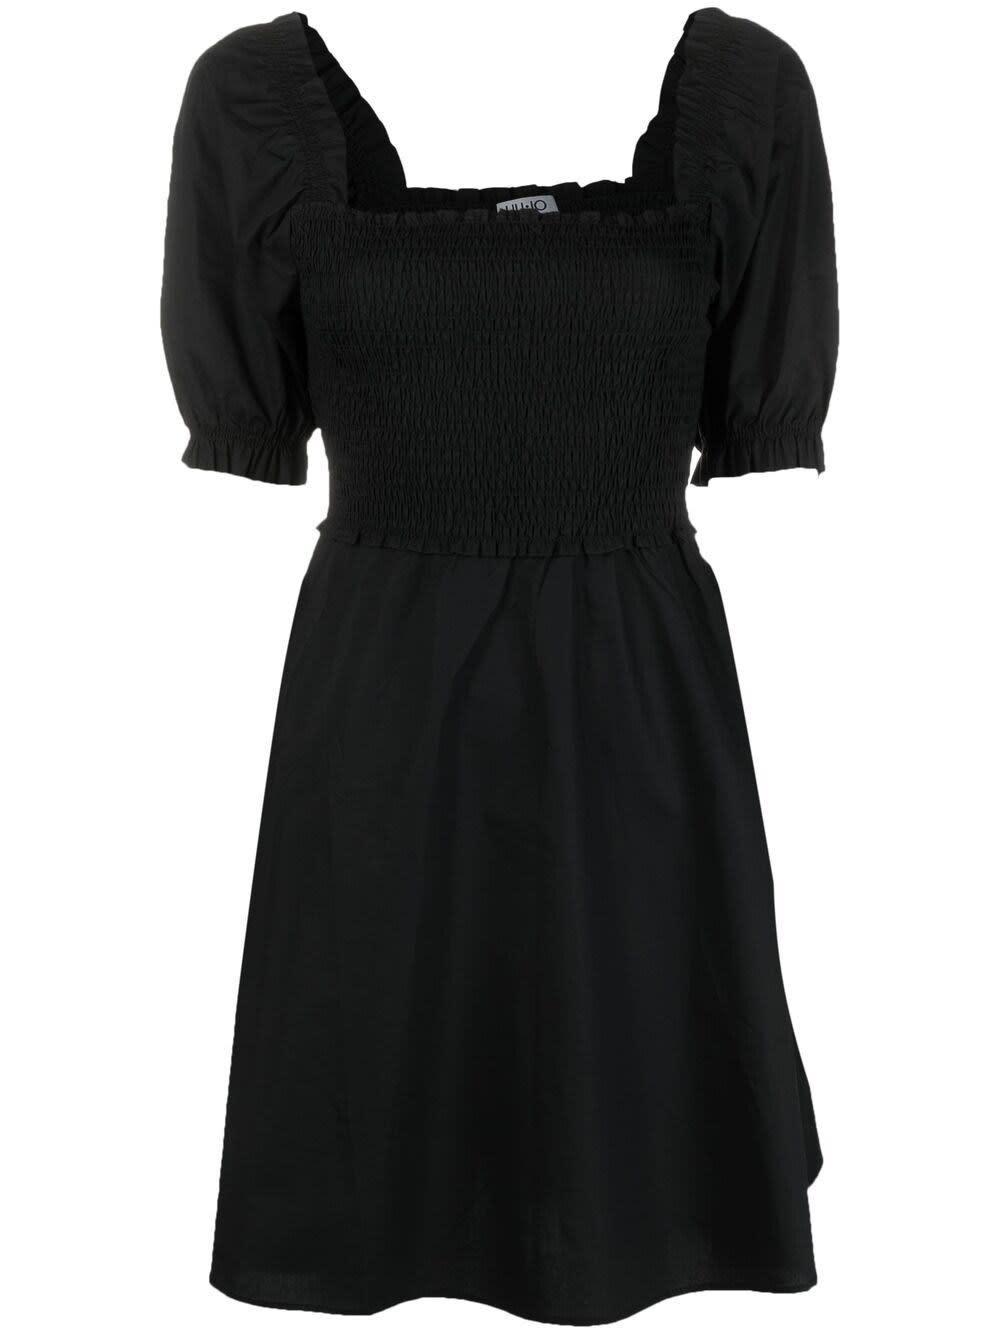 Liu •jo BLACK COTTON DRESS WITH PUFF SLEEVES